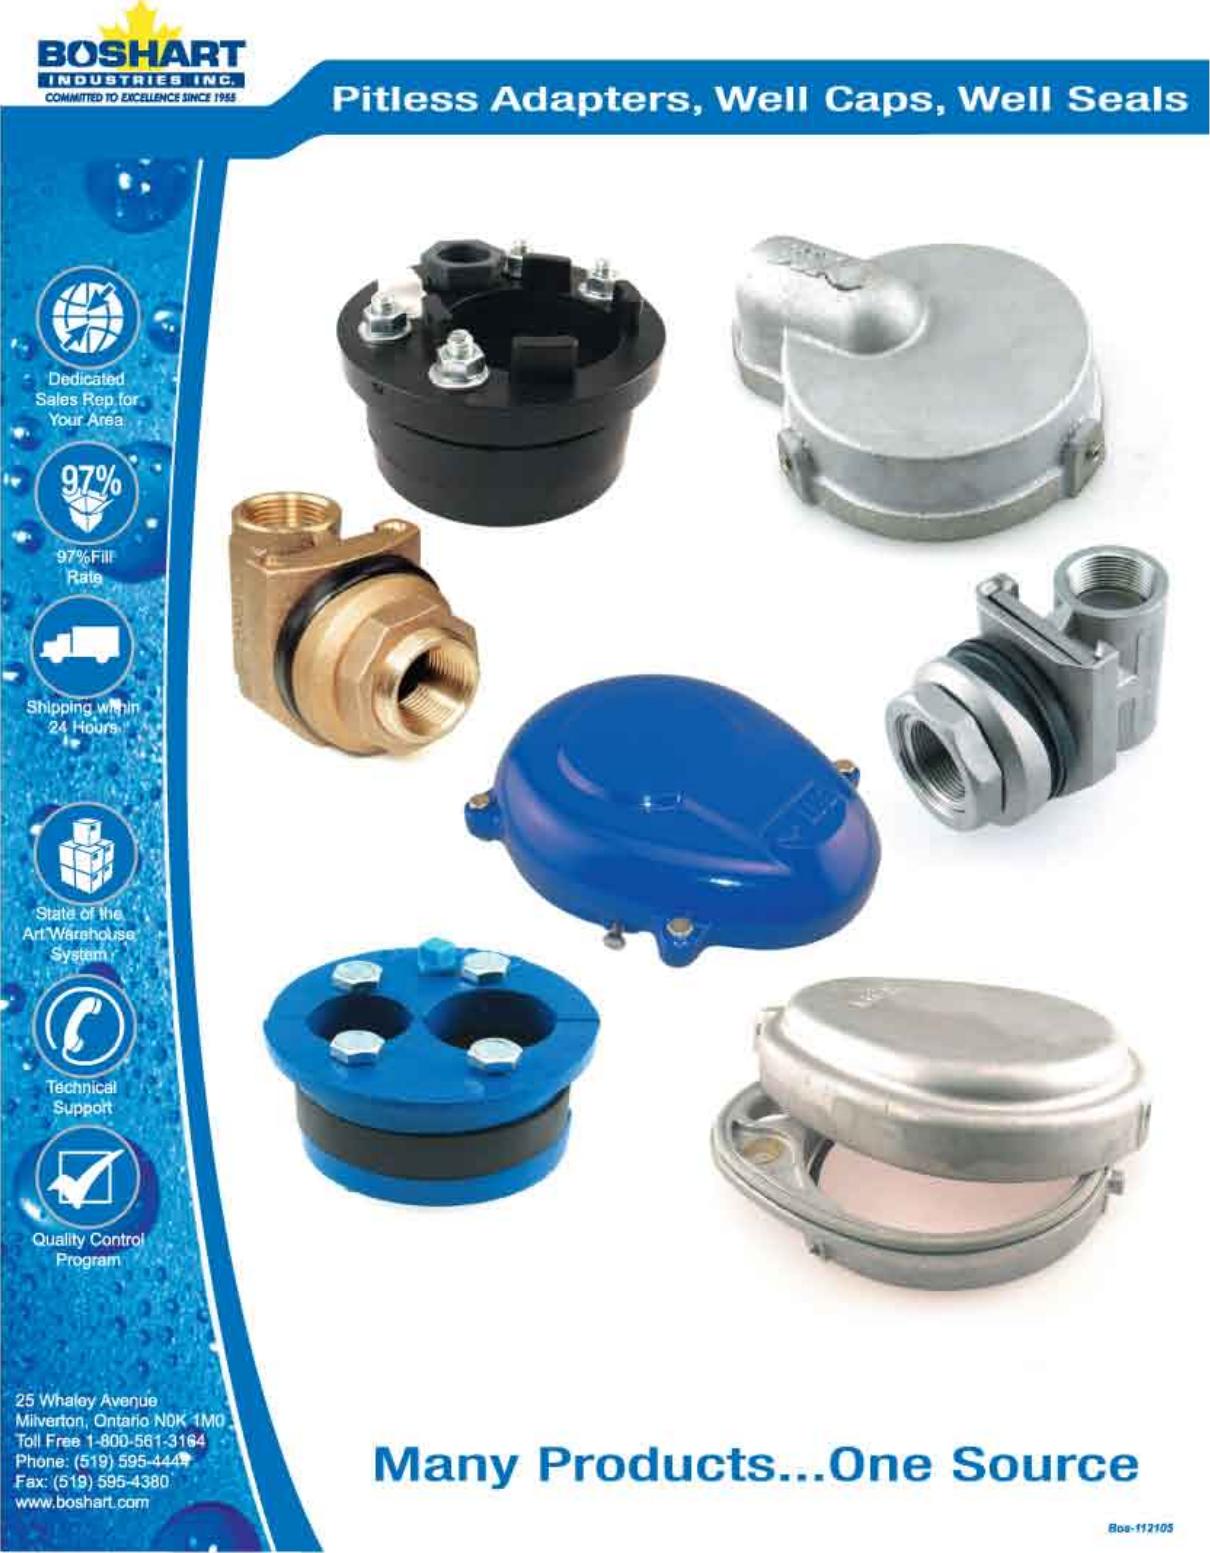 Pitless Adapters Well Caps Seals 548342 1 Boshart PA 100NL Bronze